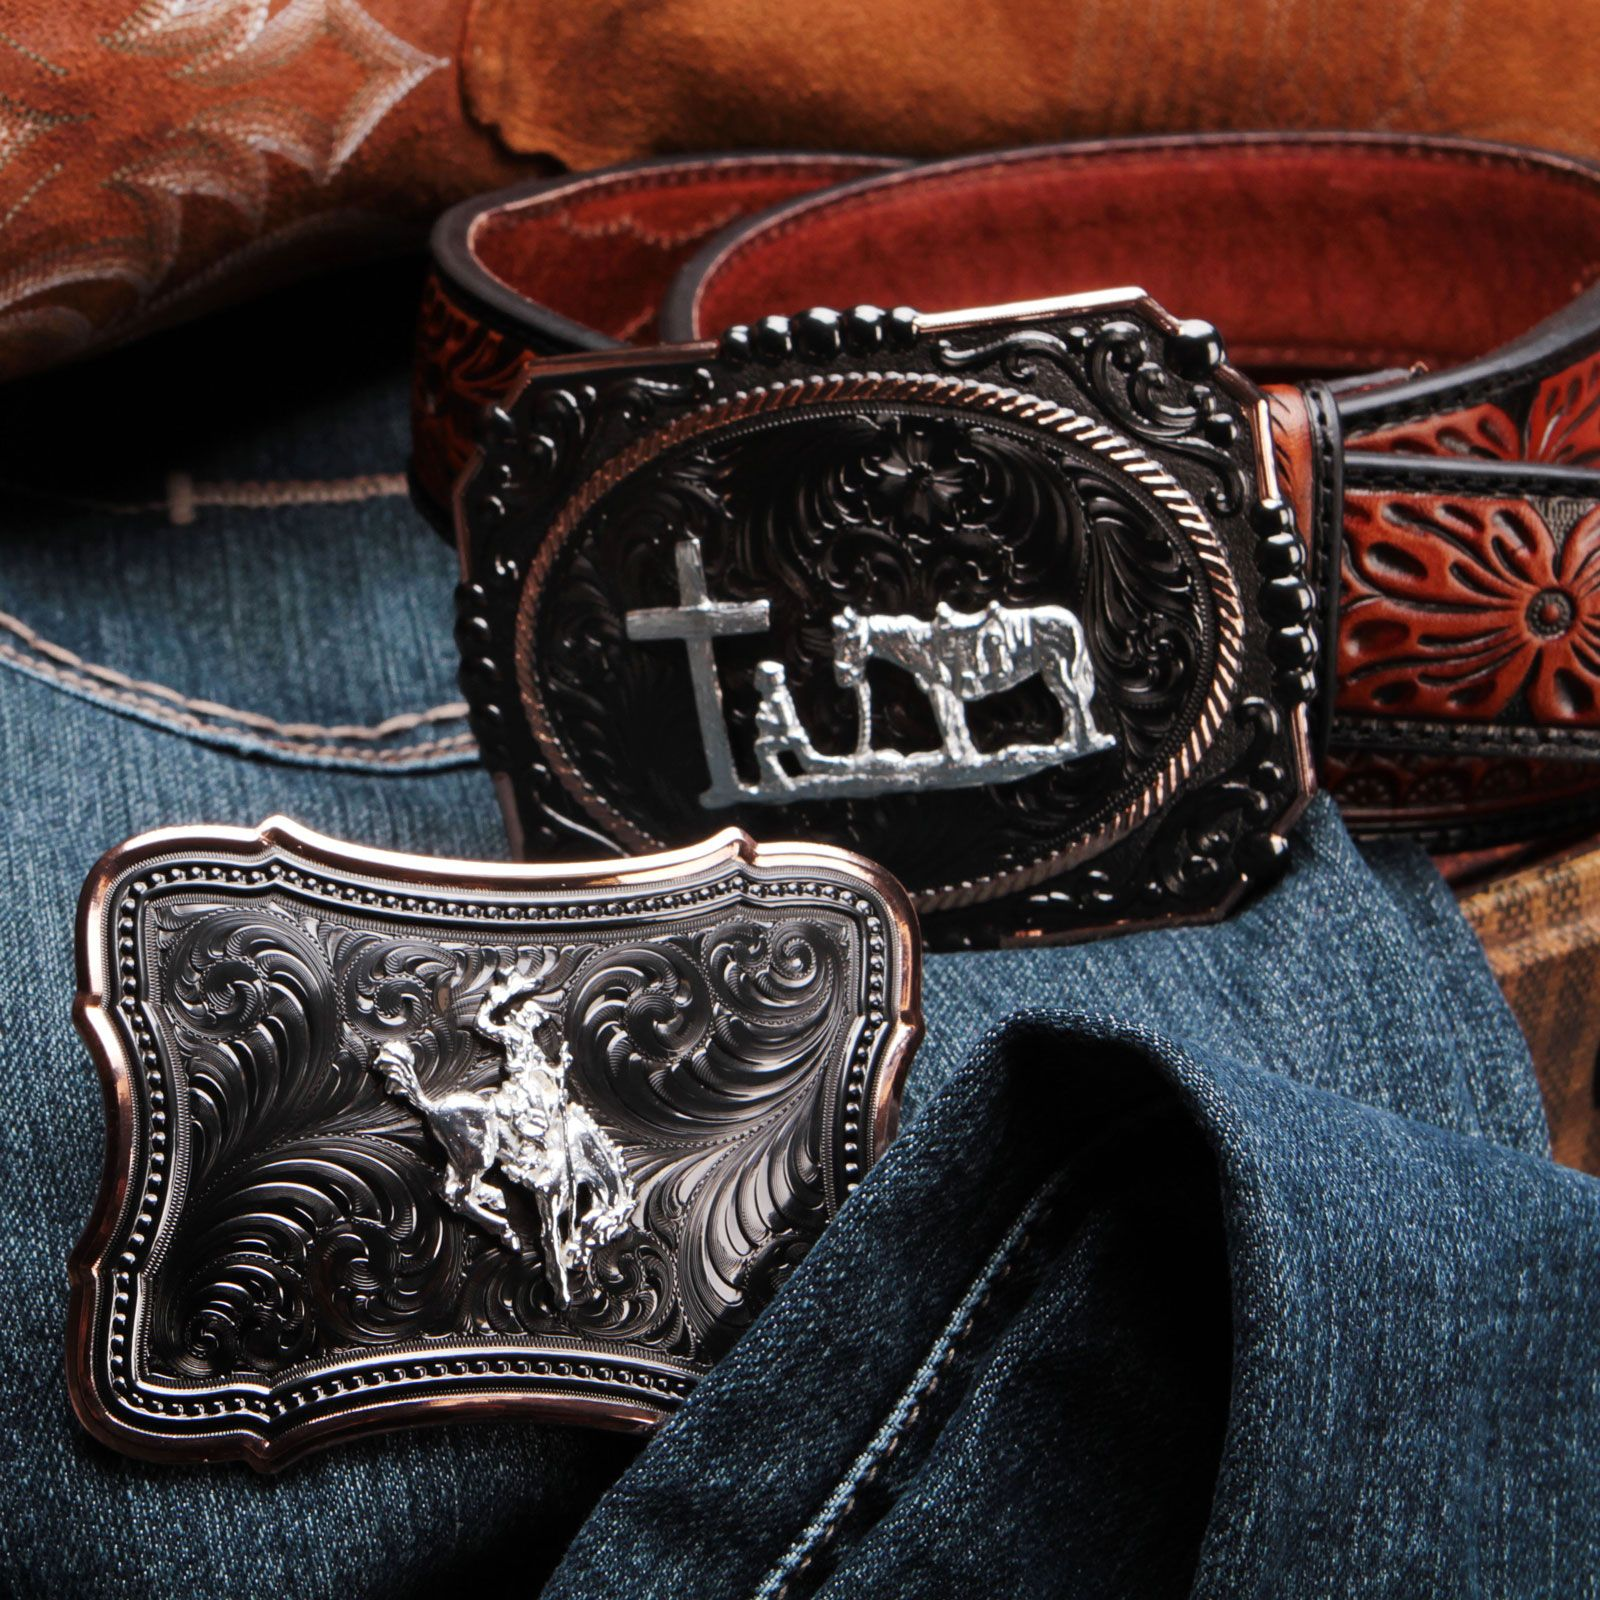 Alloy Western Cowboy Cowgirls Belt Buckle Fashion Clothing Jeans Accessory